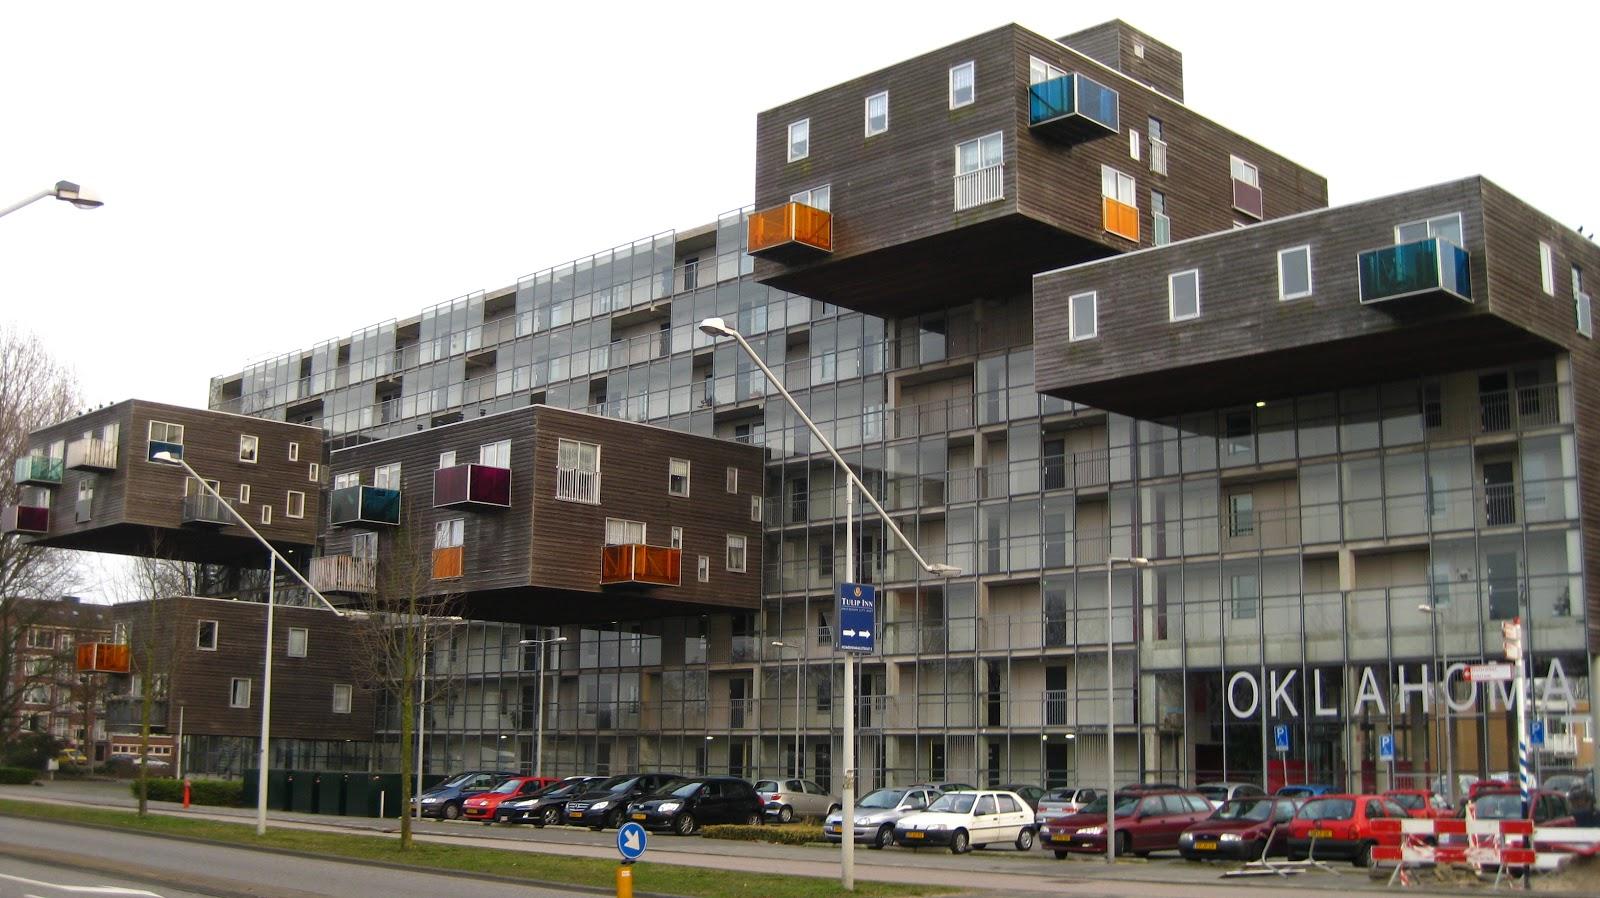 Concretely Speaking: Wozoco Apartments (Amsterdam, the ...